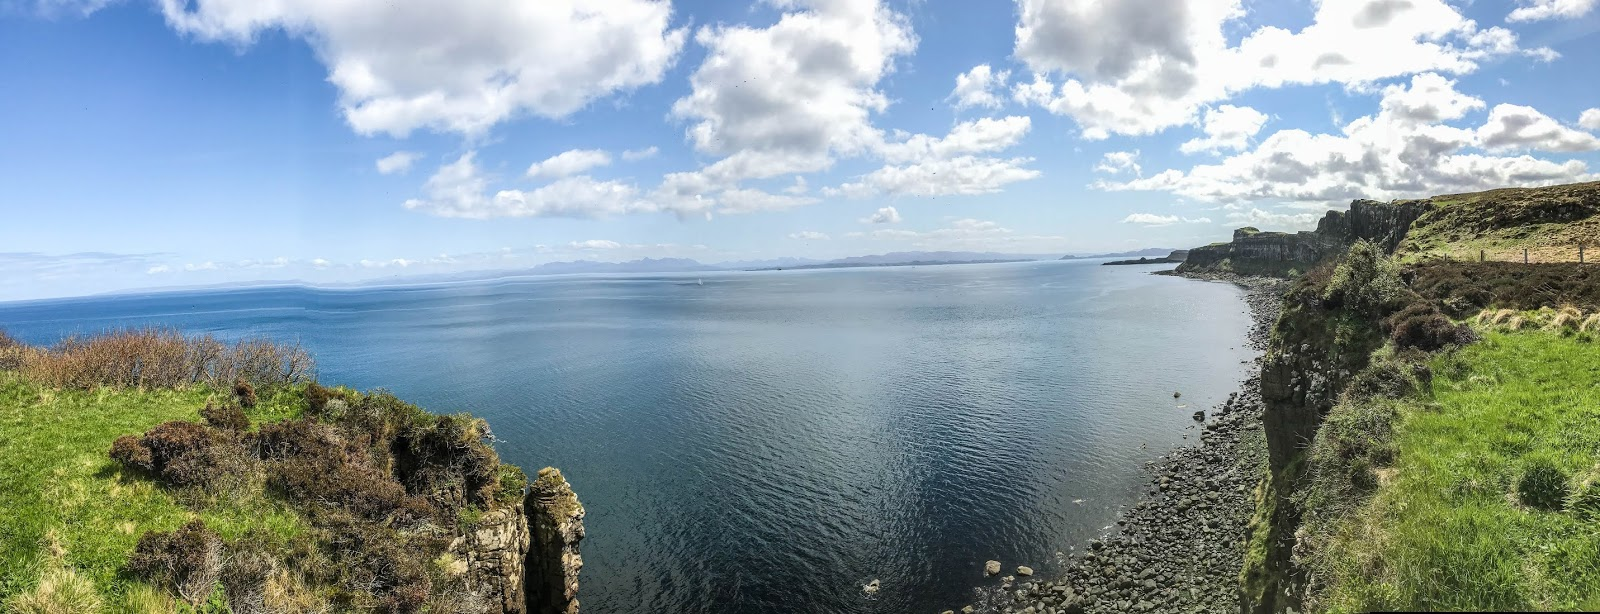 Isle of skye, scotland, summer in scotland, atlantic ocean